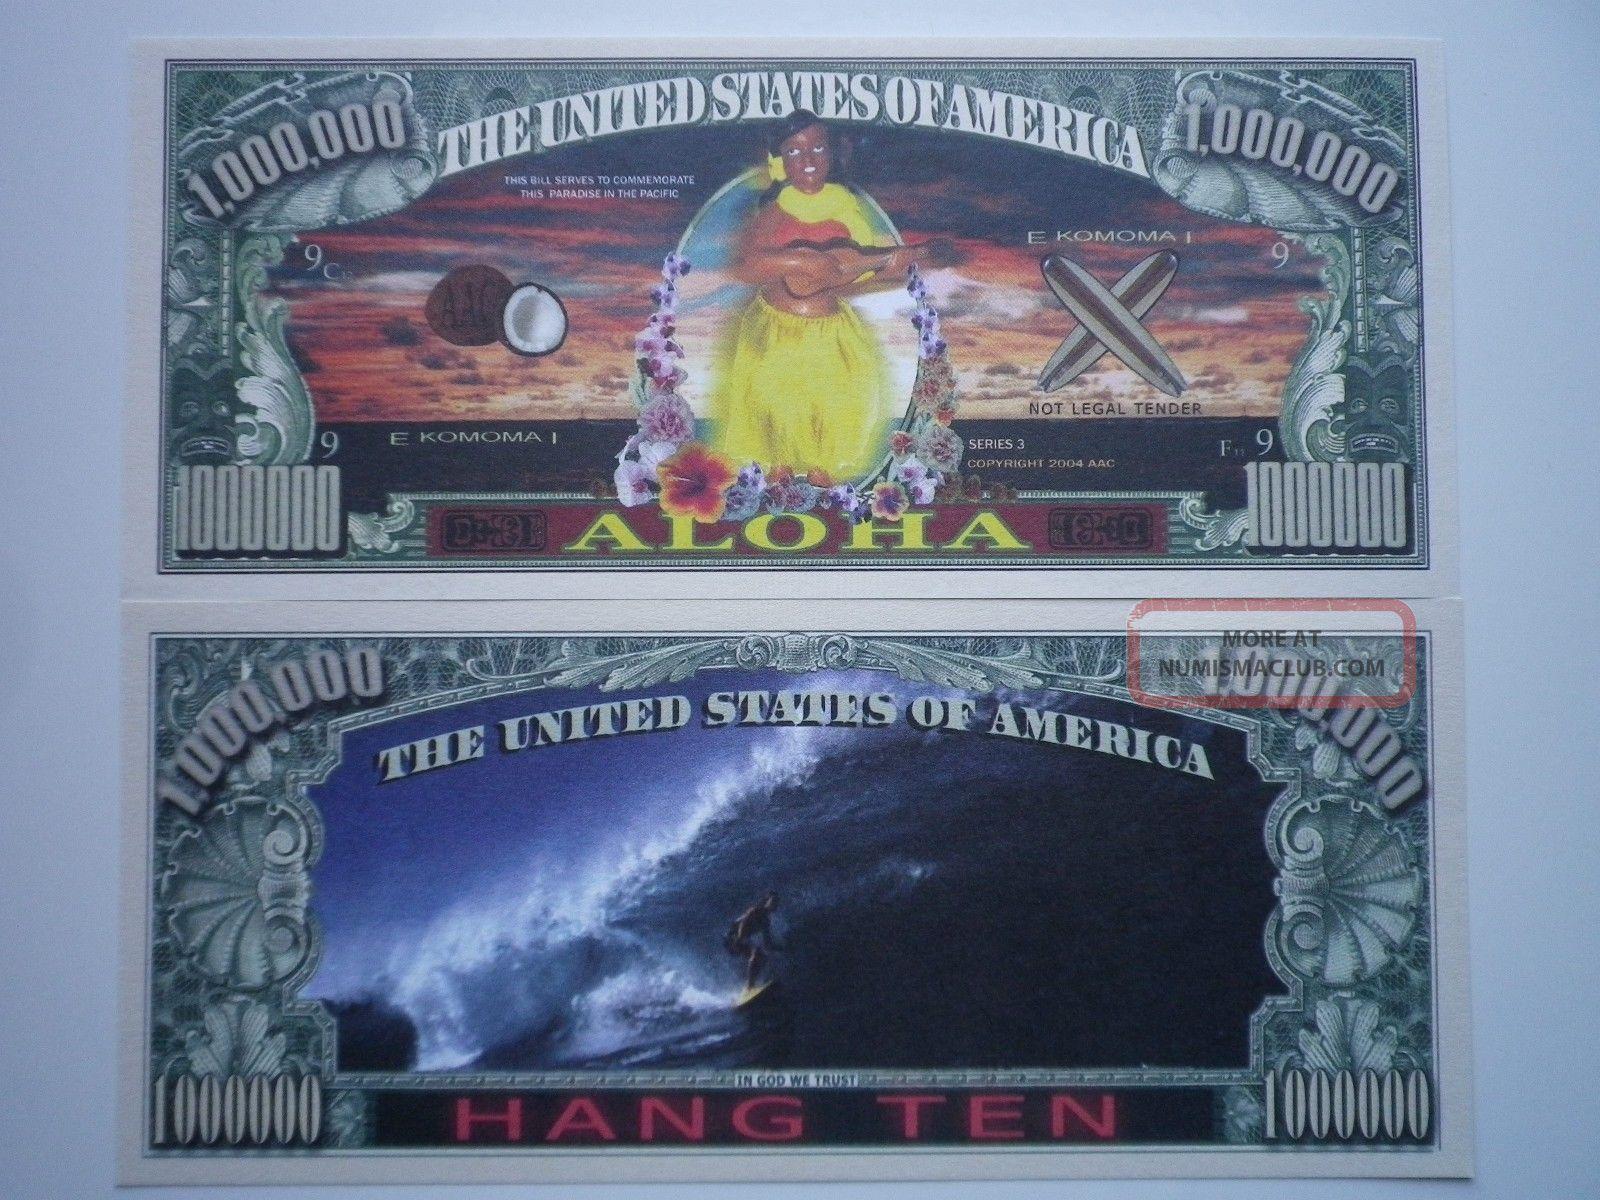 2 Bills - Aloha Hawaii Novelty Currency Bill,  Currency Holder 2/$1.  00 Paper Money: US photo